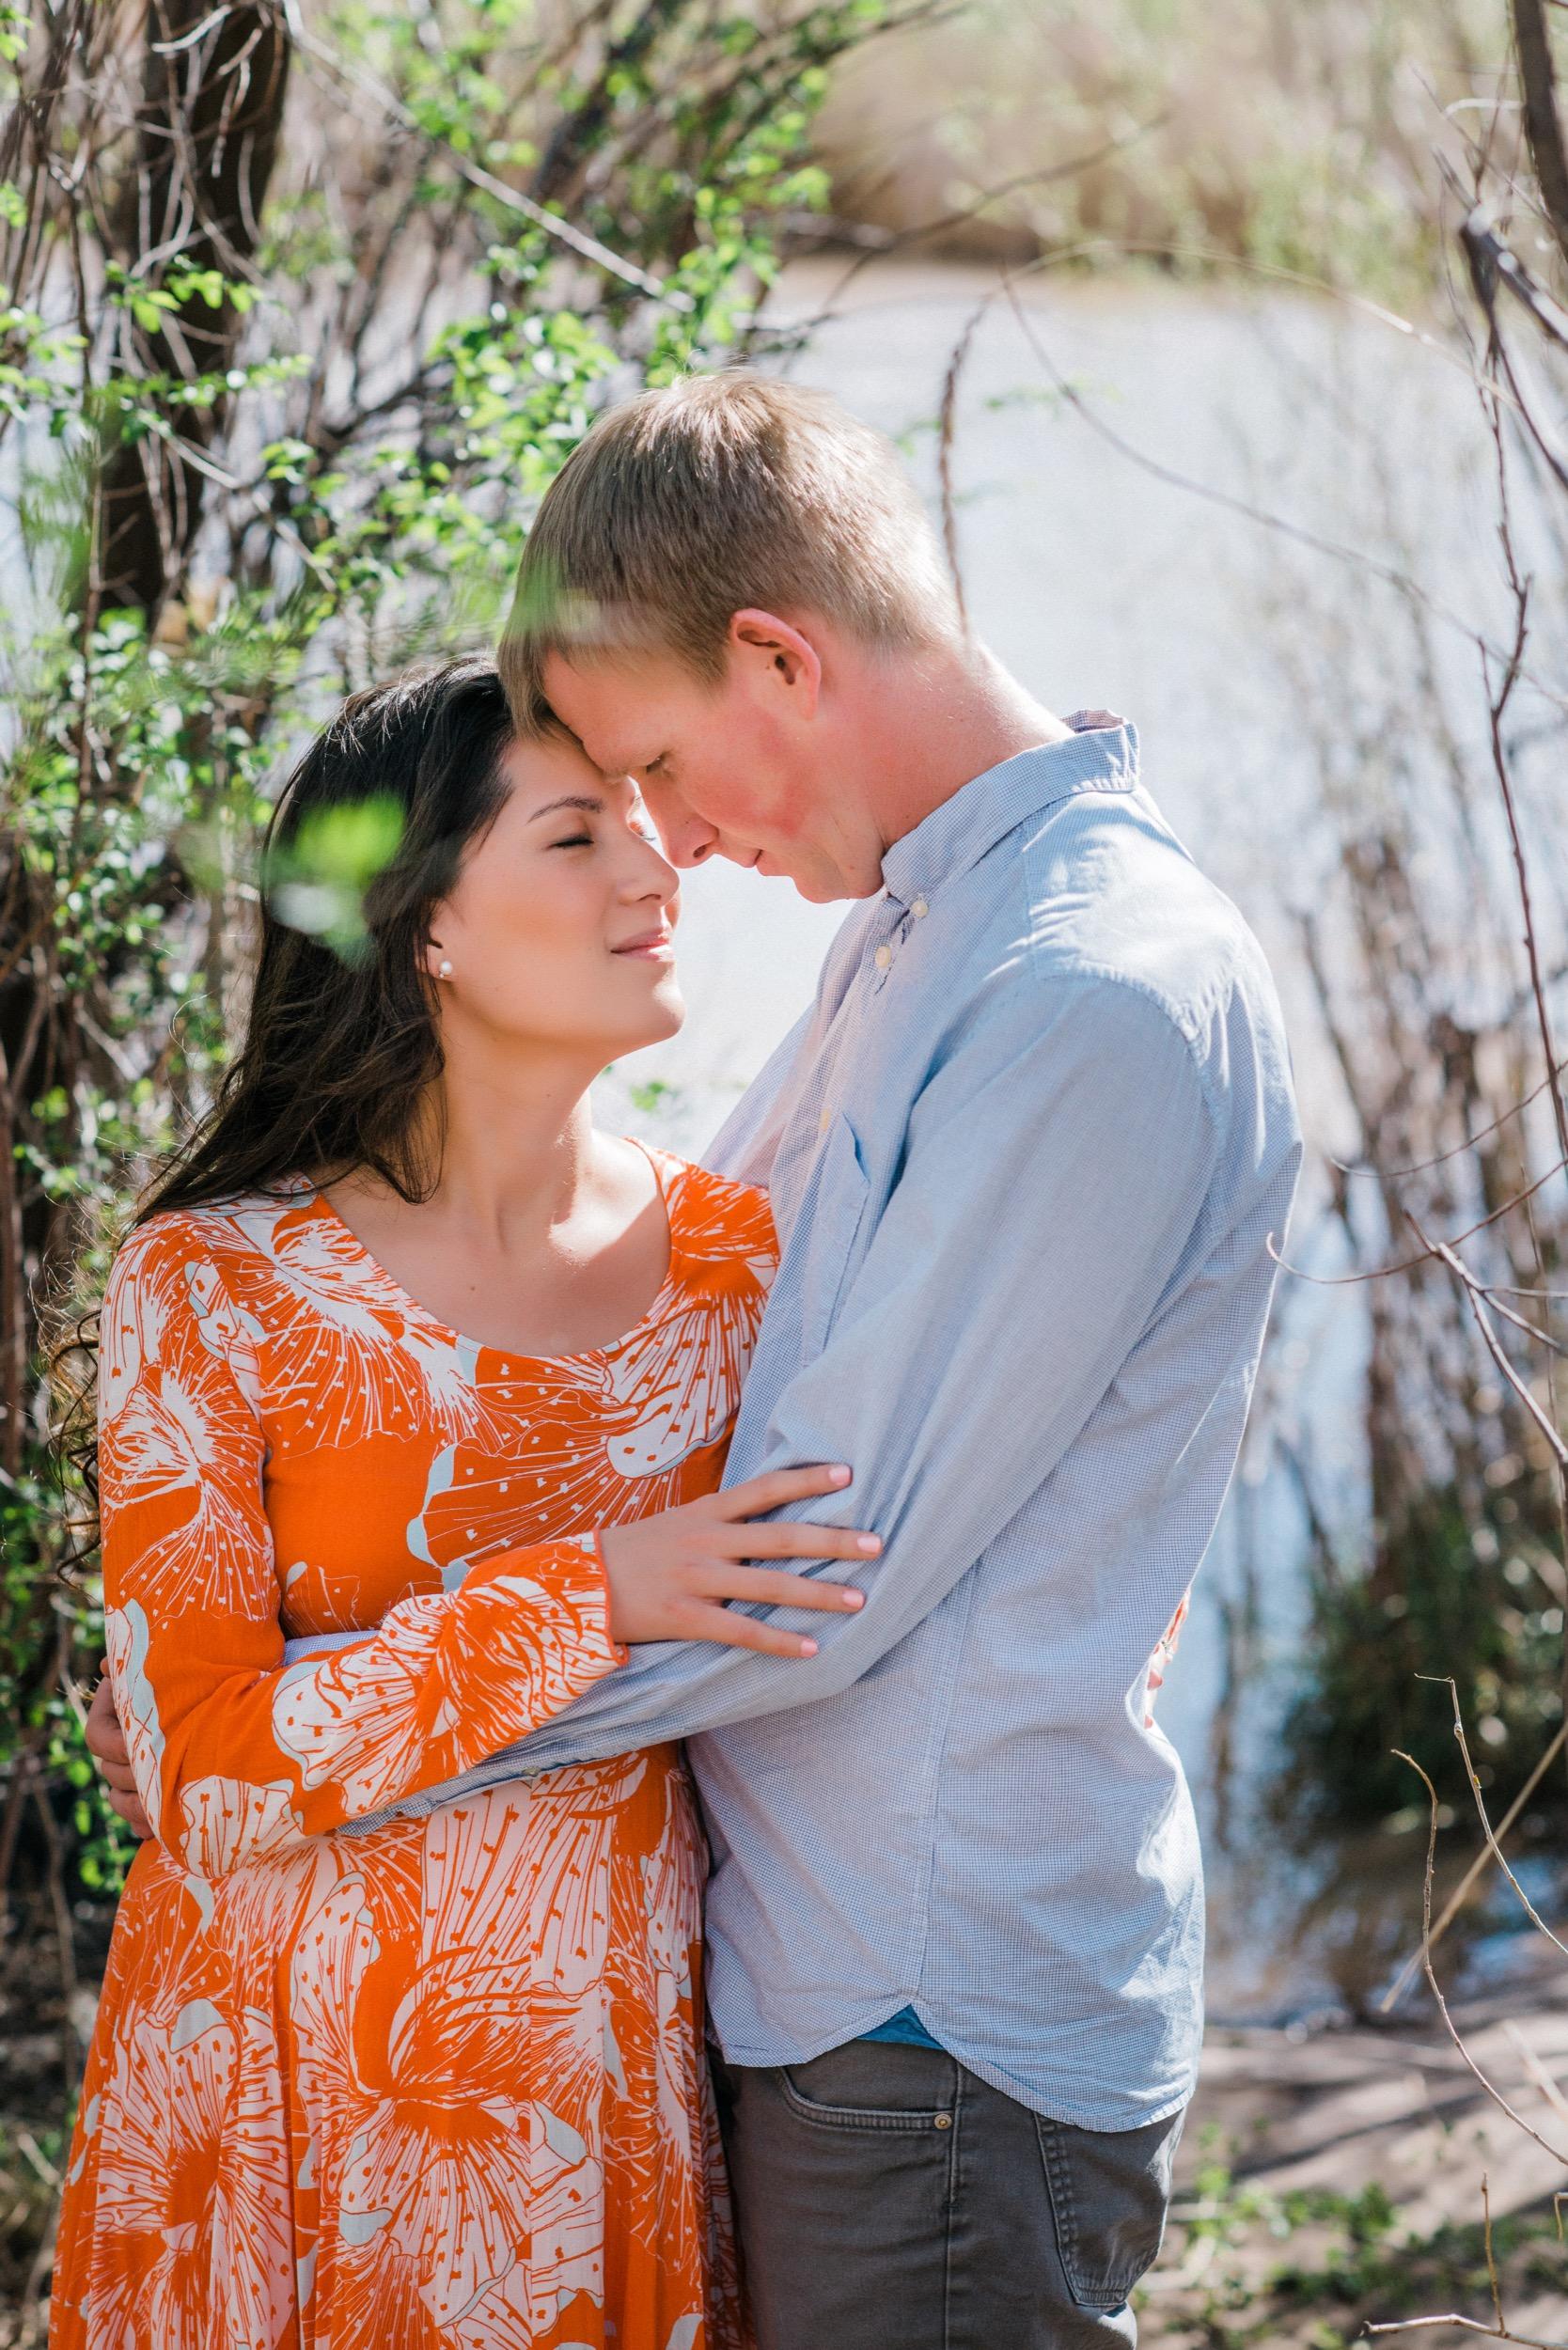 Carissa and Ben-maternity-southwest photographer-destination photographer-new mexico wedding-1027.jpg